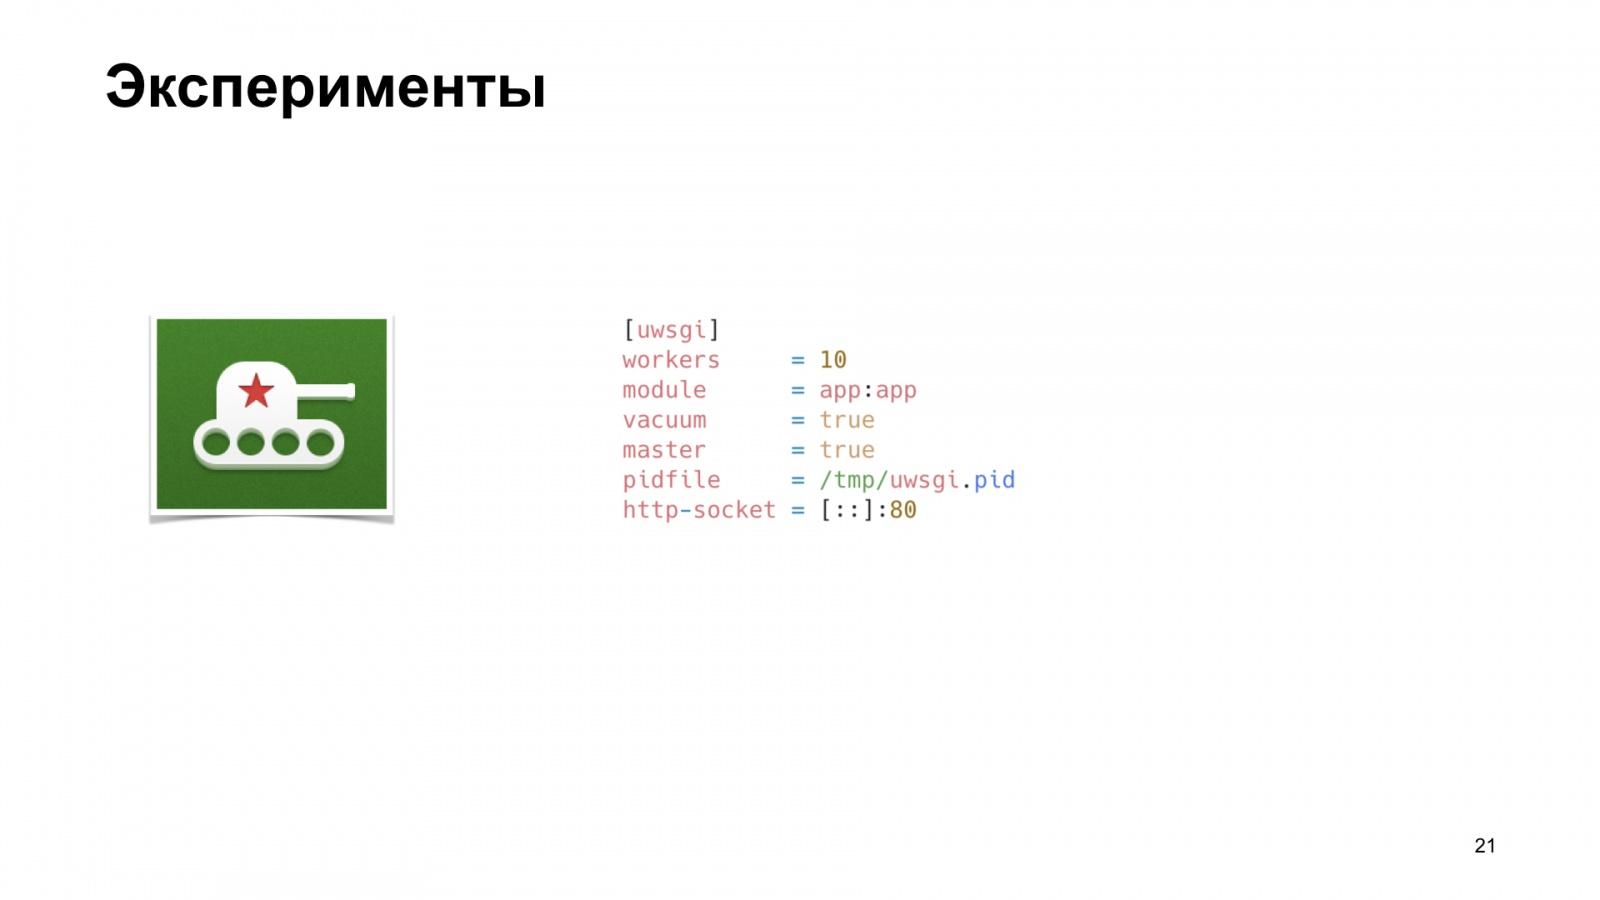 uWSGI в помощь метрикам. Доклад Яндекса - 14